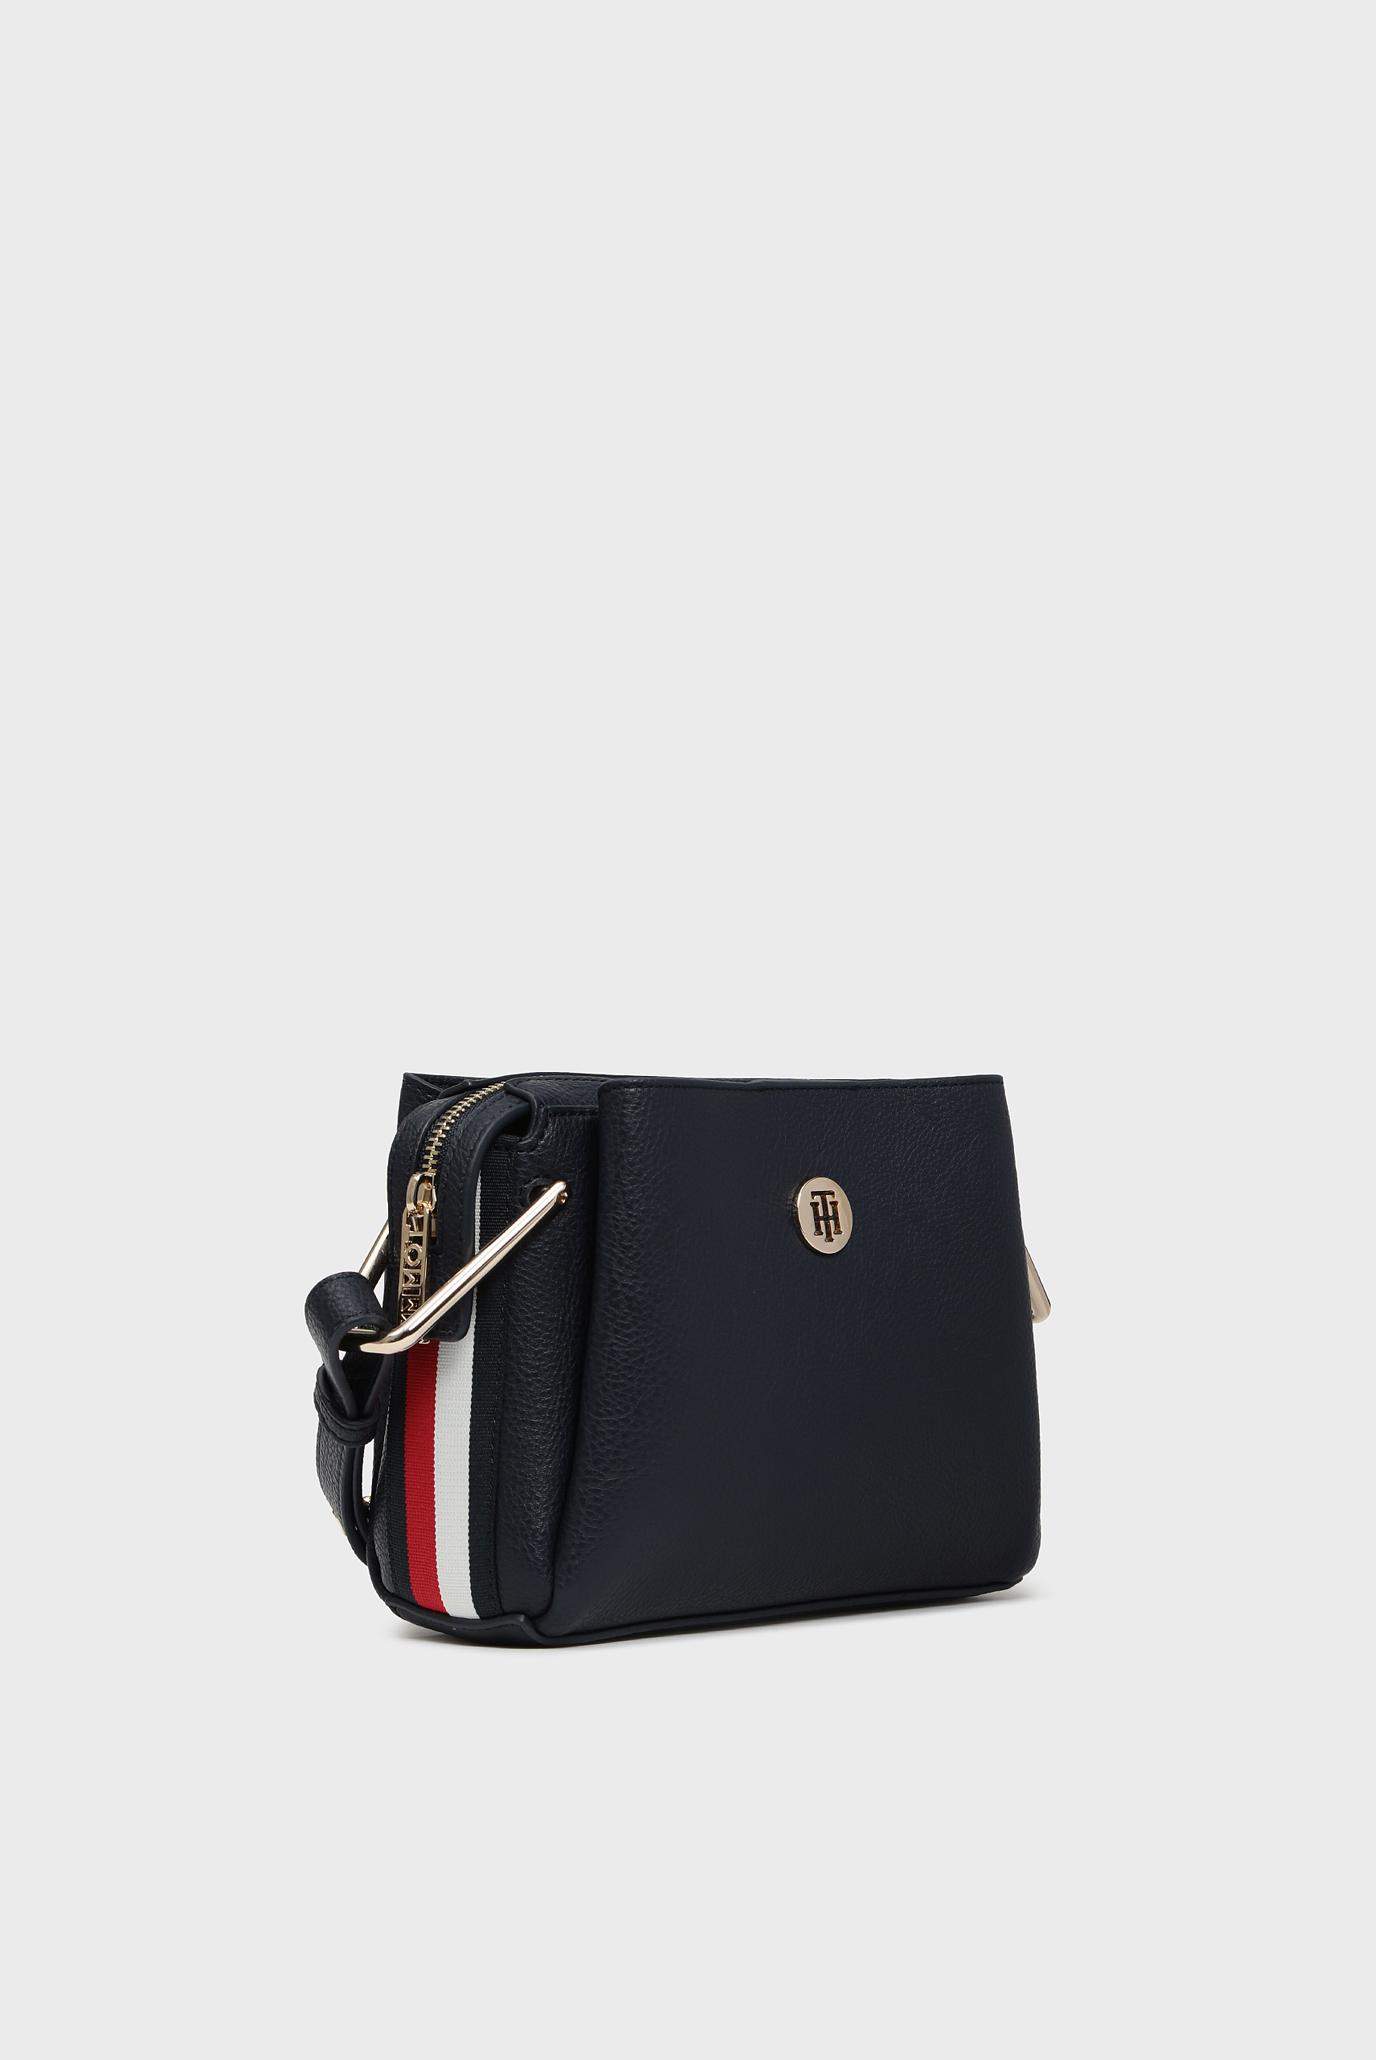 Женская темно-синяя сумка через плечо TH CORE CROSSOVER CORP Tommy Hilfiger